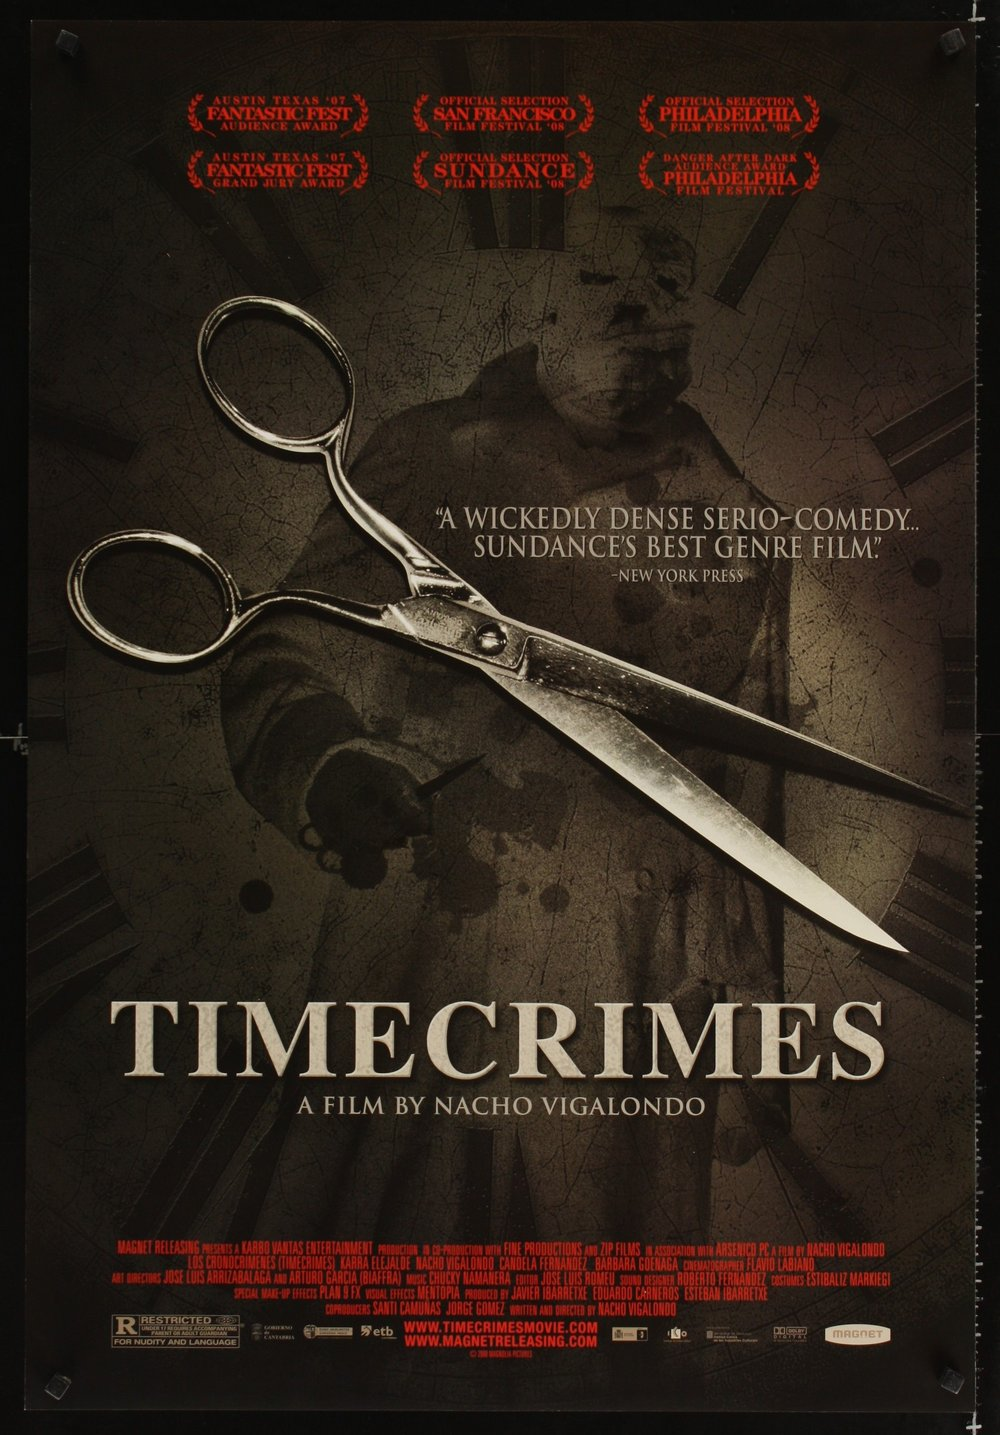 timecrimes-ds-1sh-07-los-cronocrimenes-spanish-horror-sci-fi.jpg